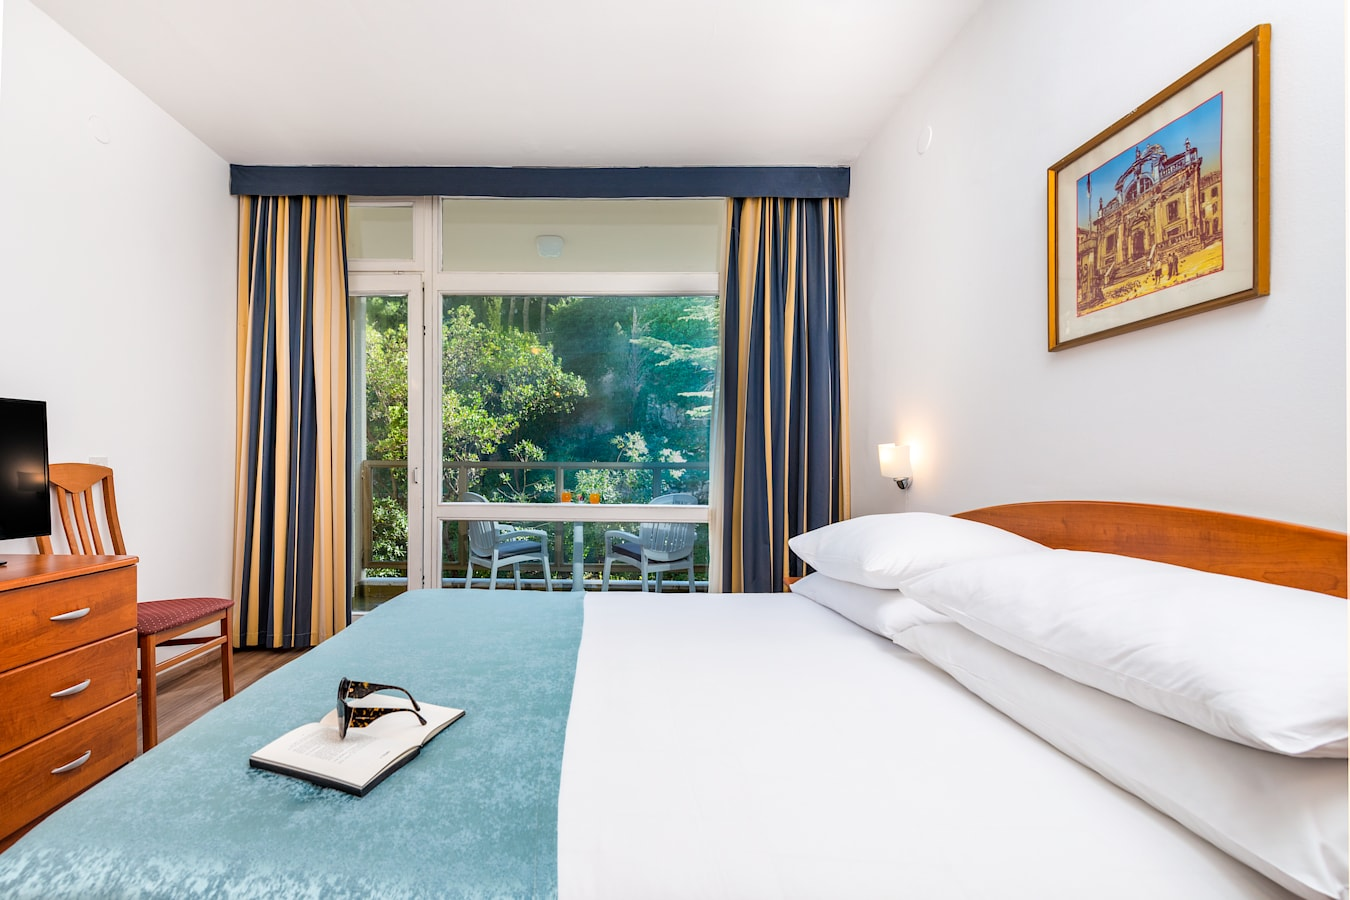 vis-hotel-dubrovnik-double-room-balcony-parkview.jpg